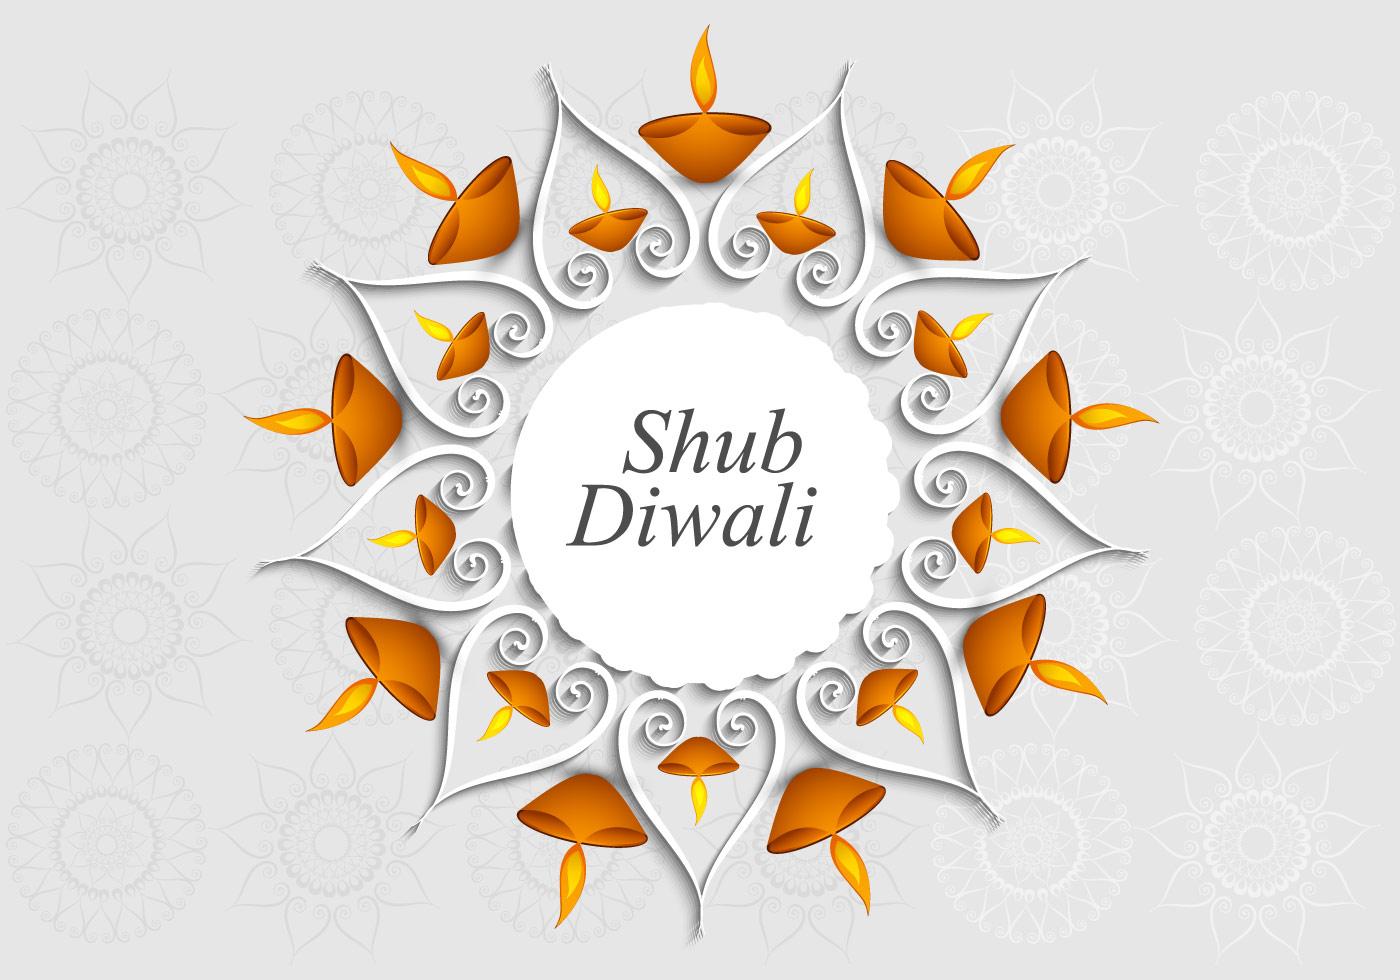 Shubh Diwali With Rangoli And Oil Lamp